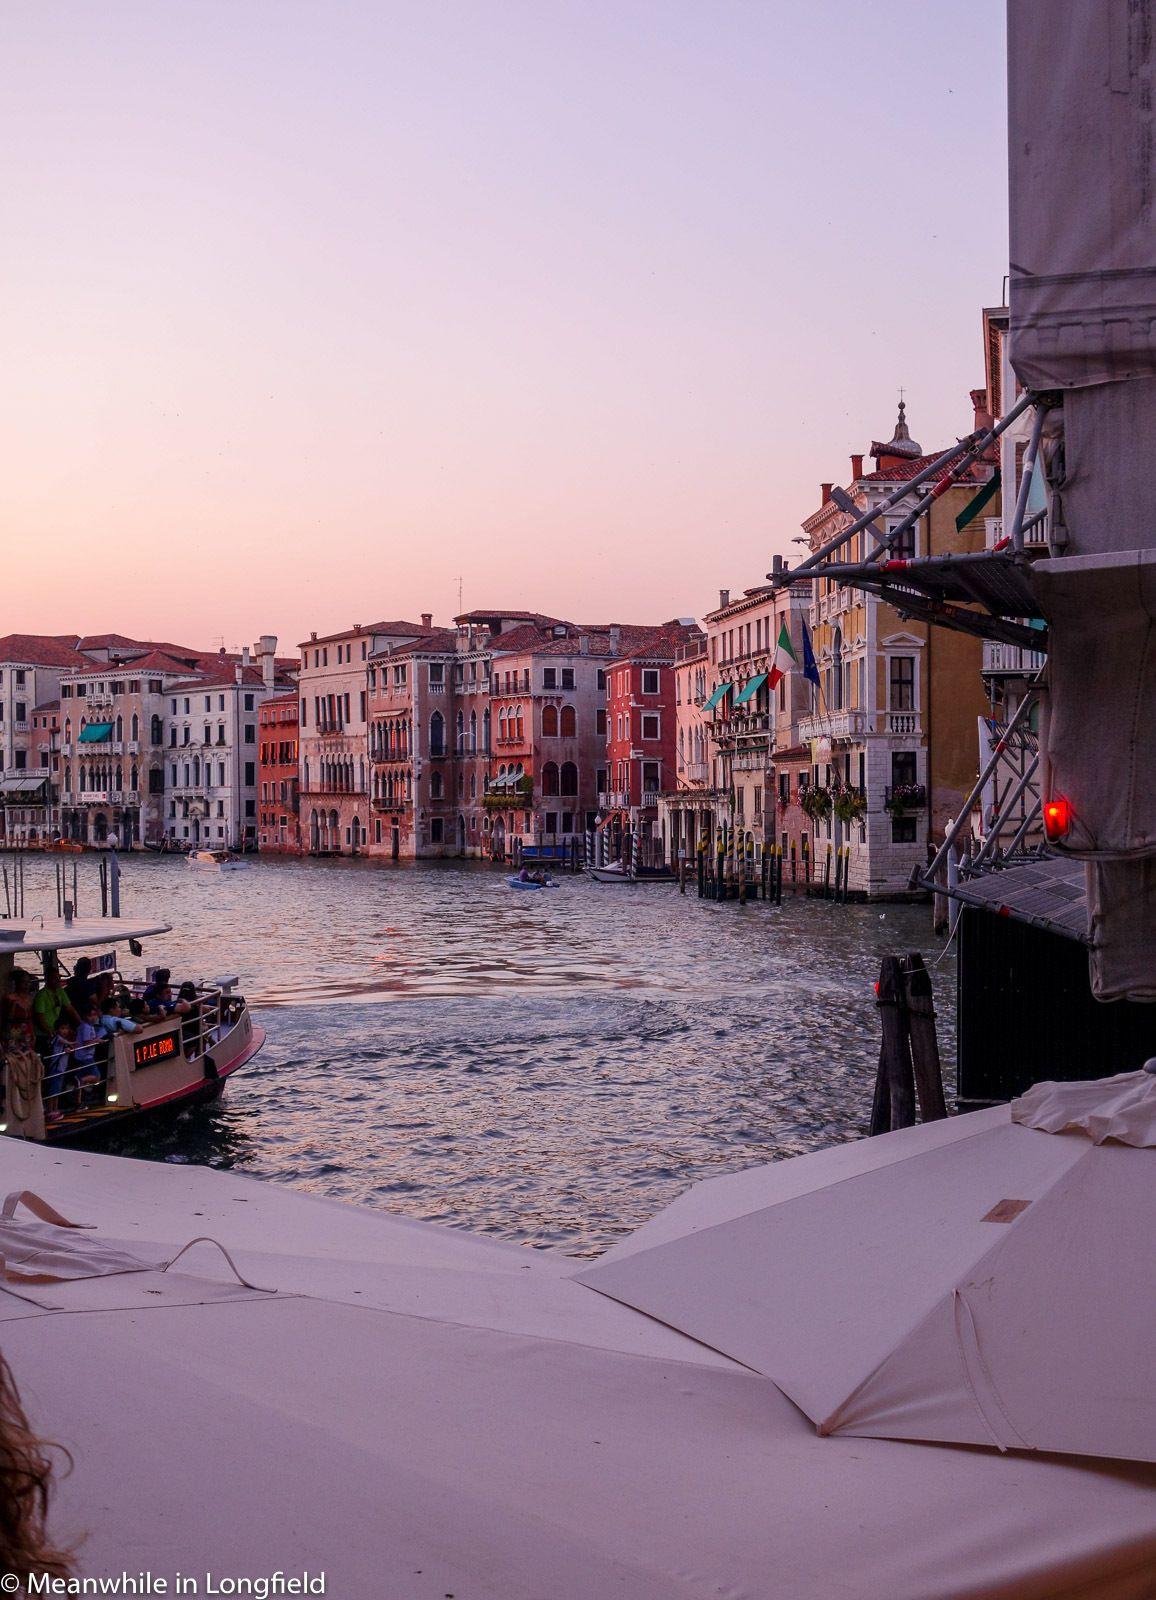 Sunset at Venezia. So nice!